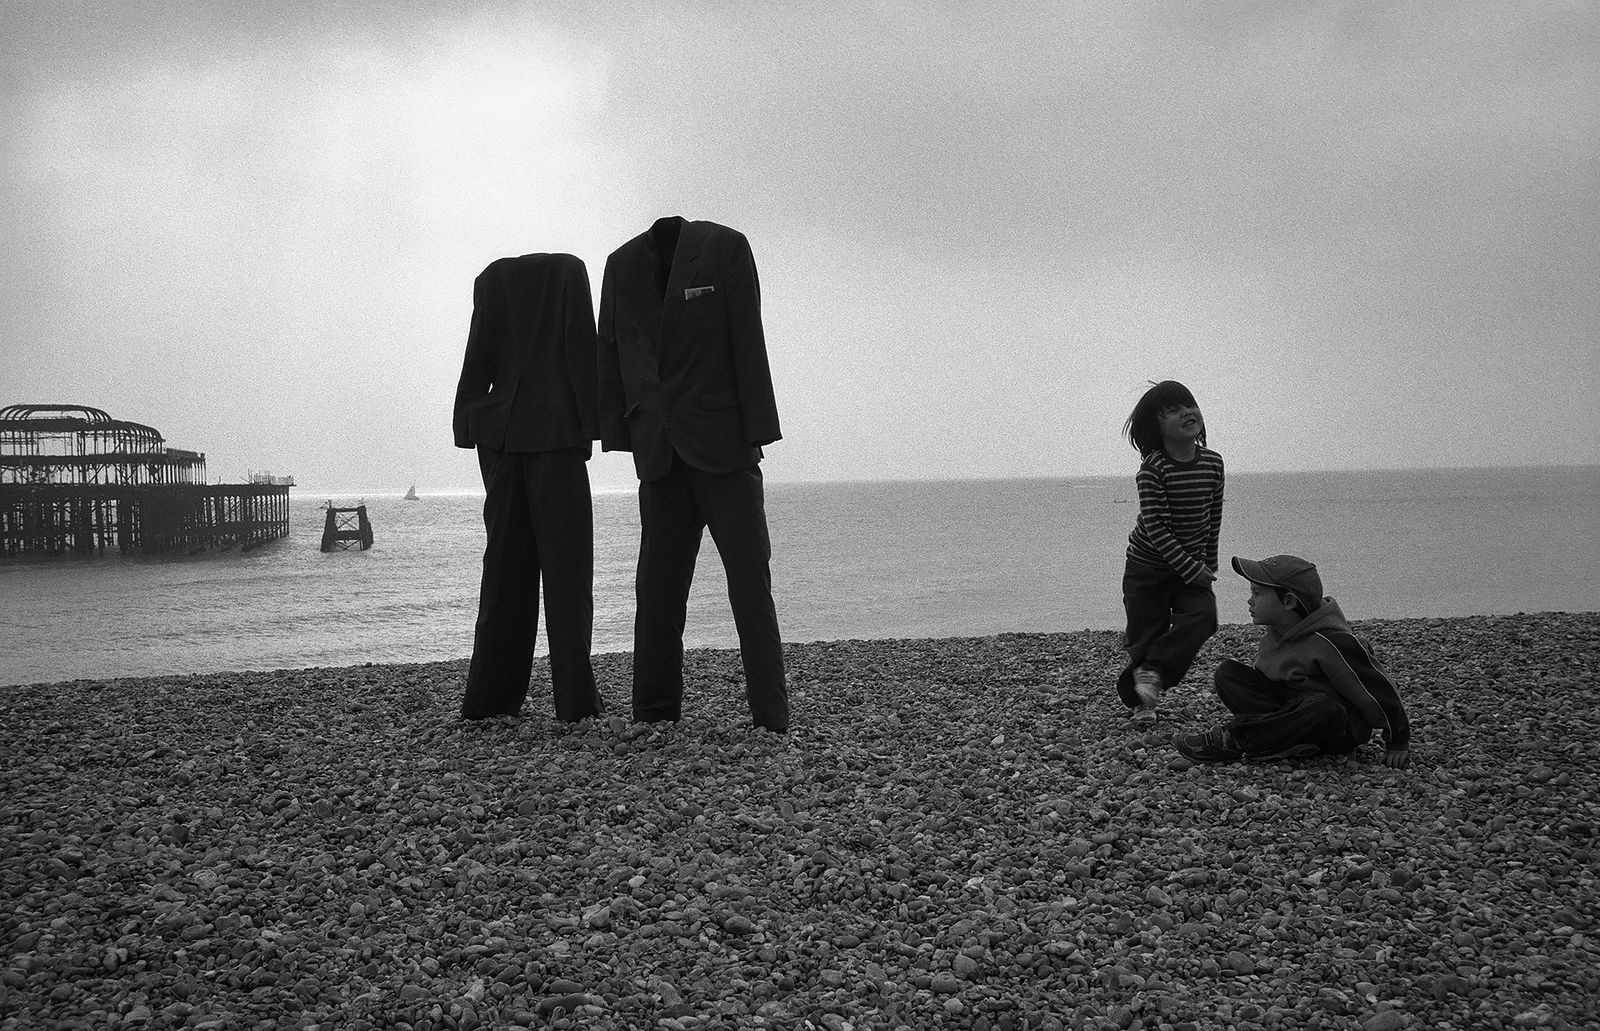 Евгений Сафьян. Manequin cities. Великобритания, Брайтон, 2006